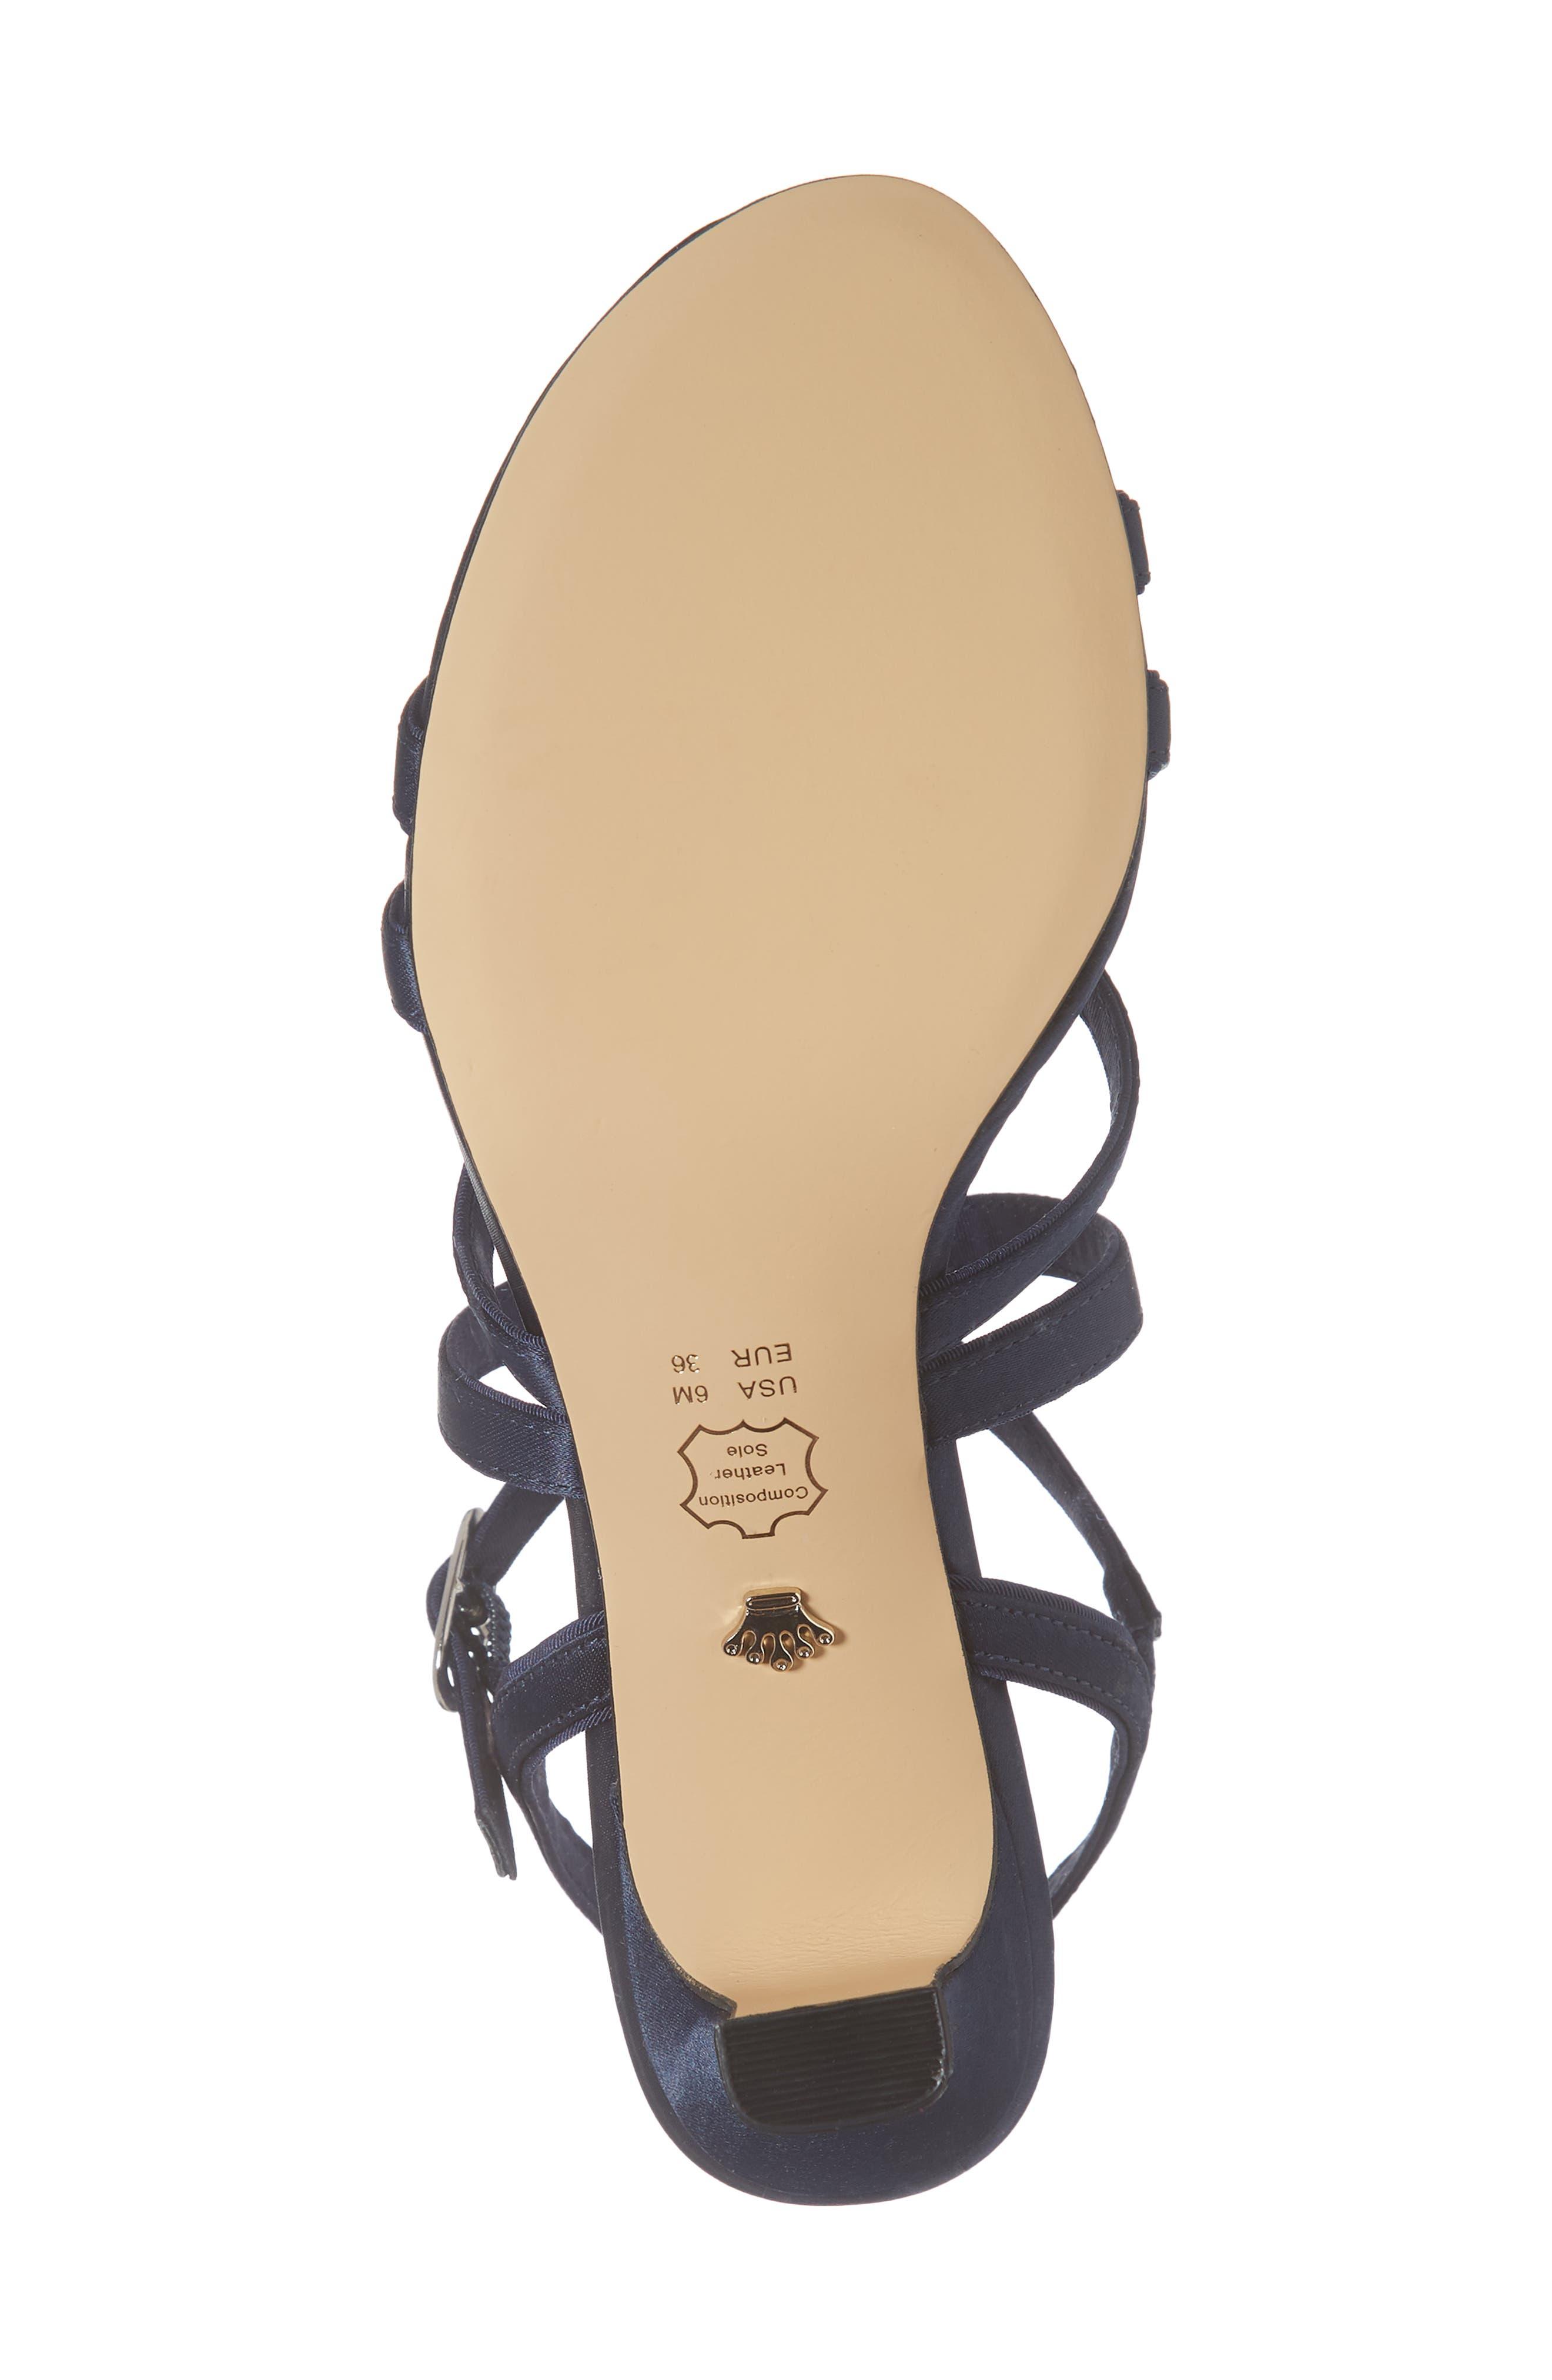 Genaya Strappy Evening Sandal,                             Alternate thumbnail 3, color,                             Navy Satin